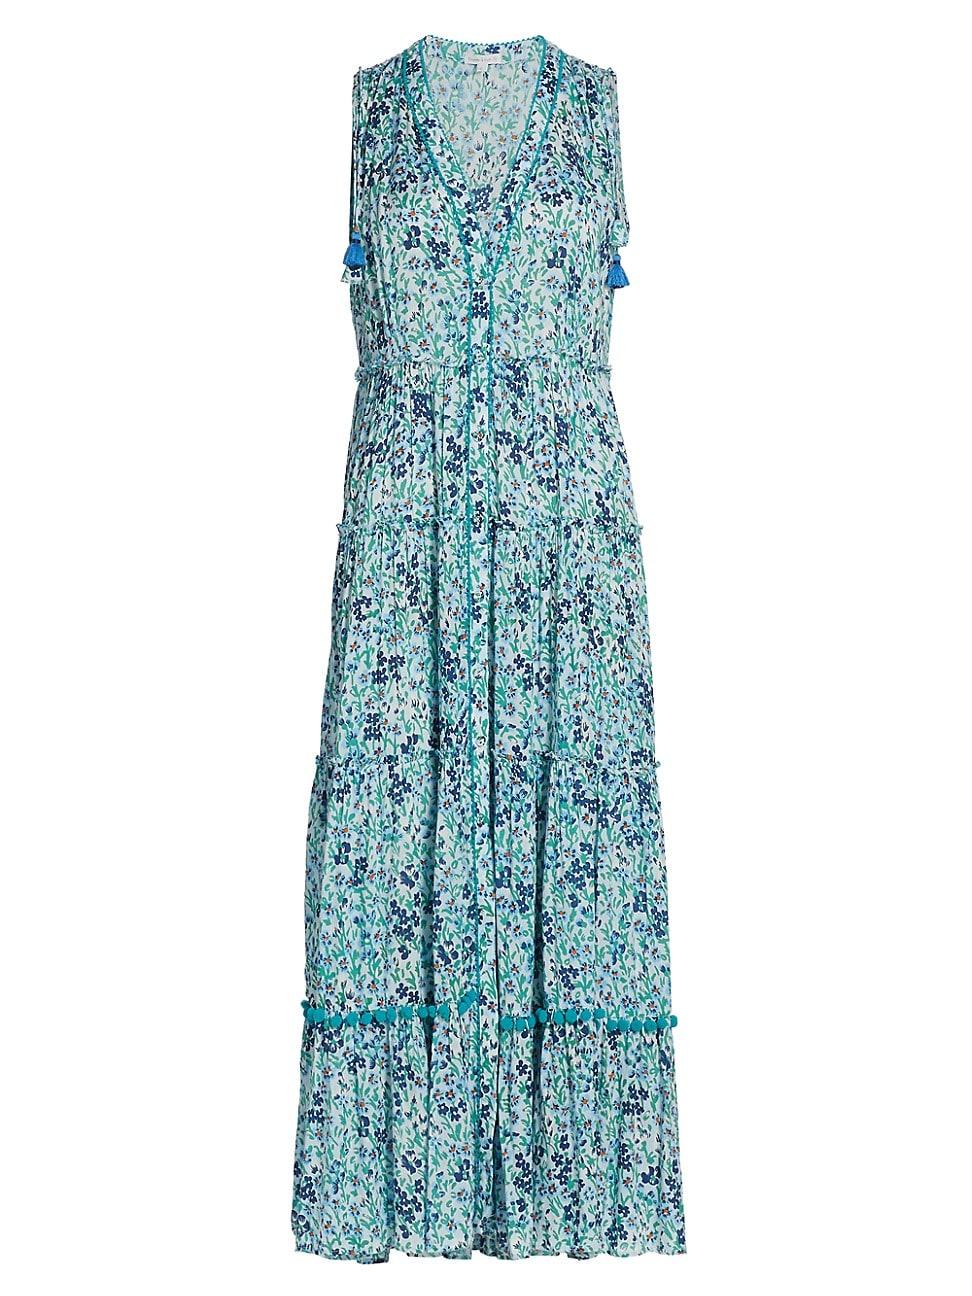 Poupette St Barth Maxi dresses WOMEN'S IVY FLORAL RUFFLE-TRIM TASSEL MAXI DRESS